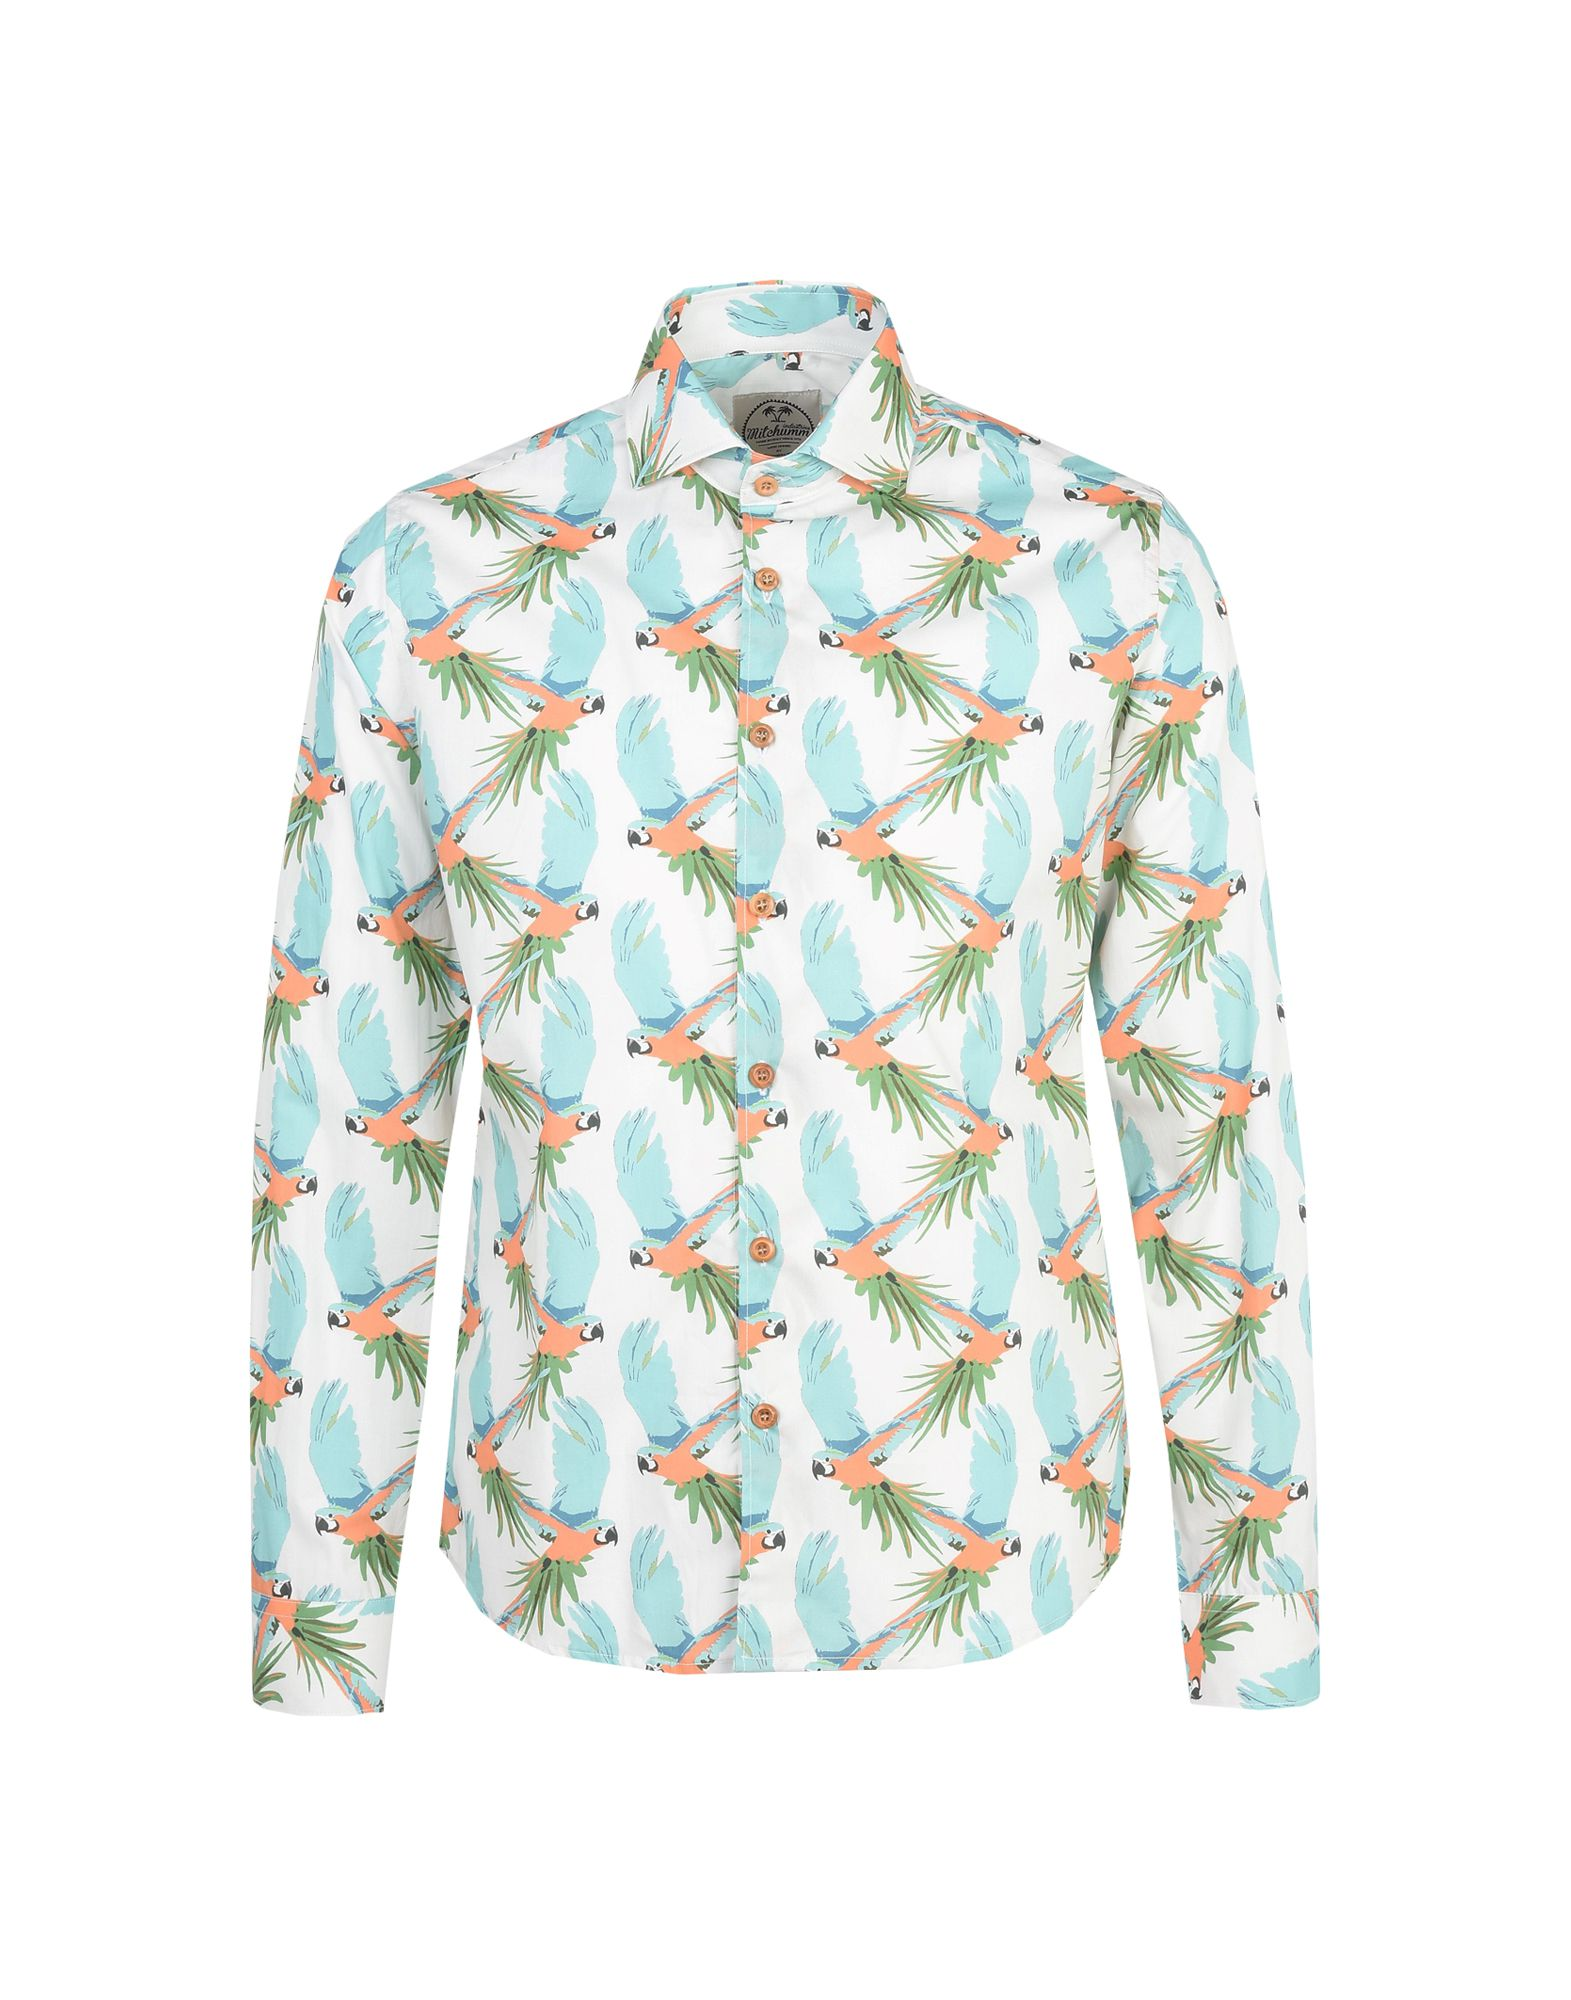 Camicia Fantasia Mitchumm Industries Uomo - Acquista online su